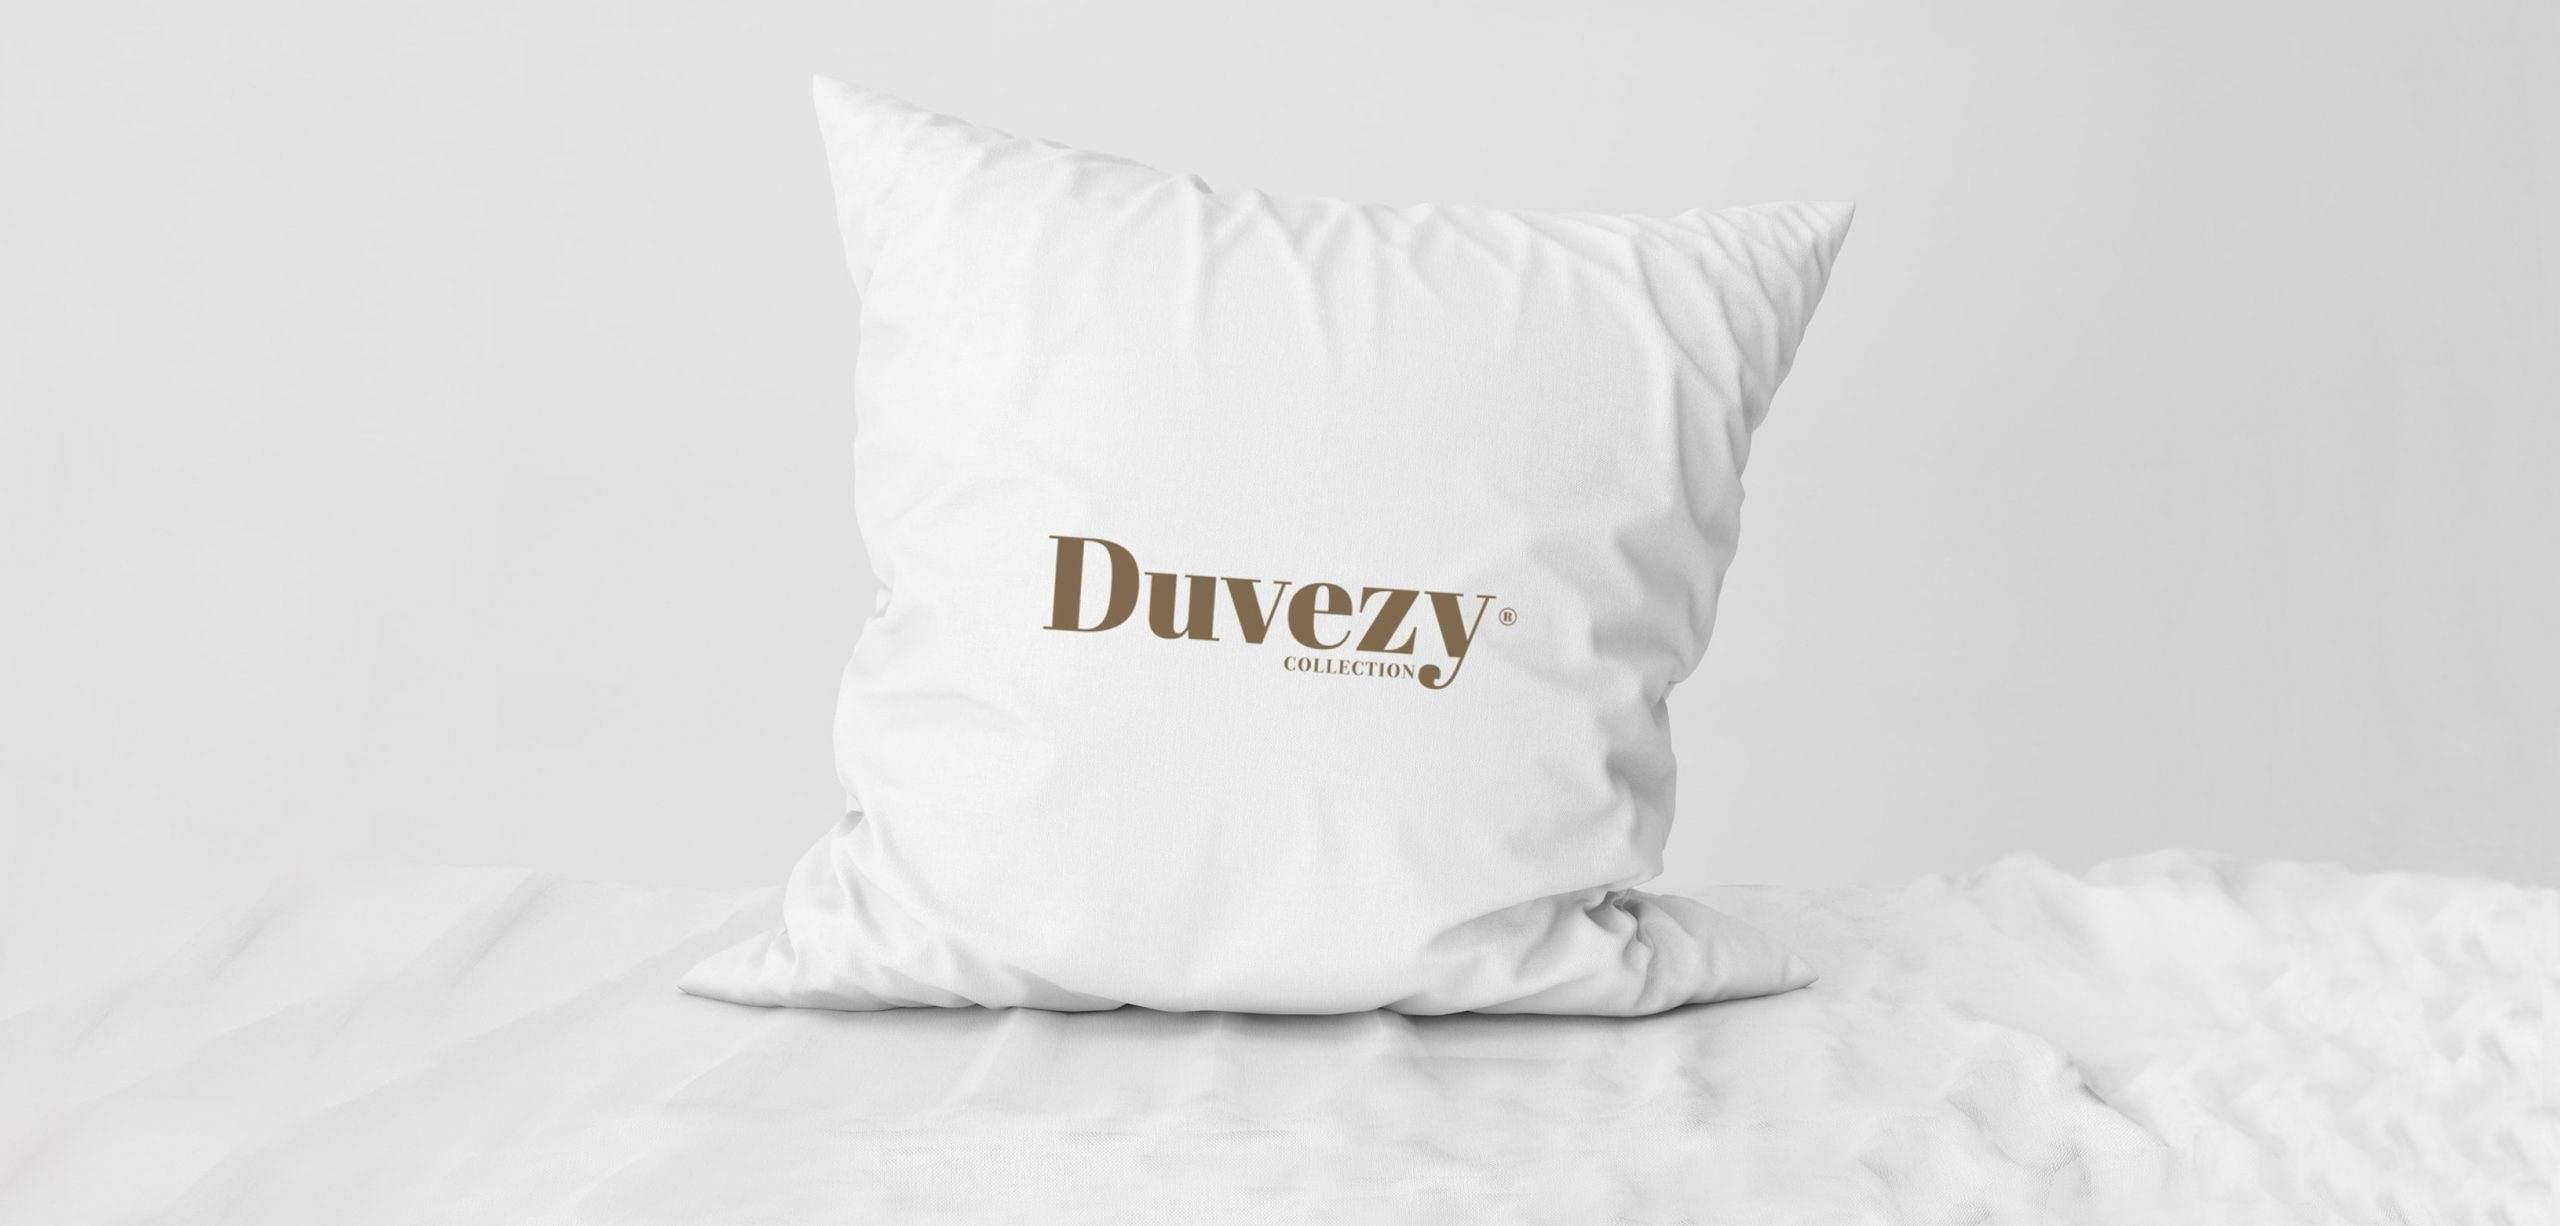 duvezy-5-1-scaled-1